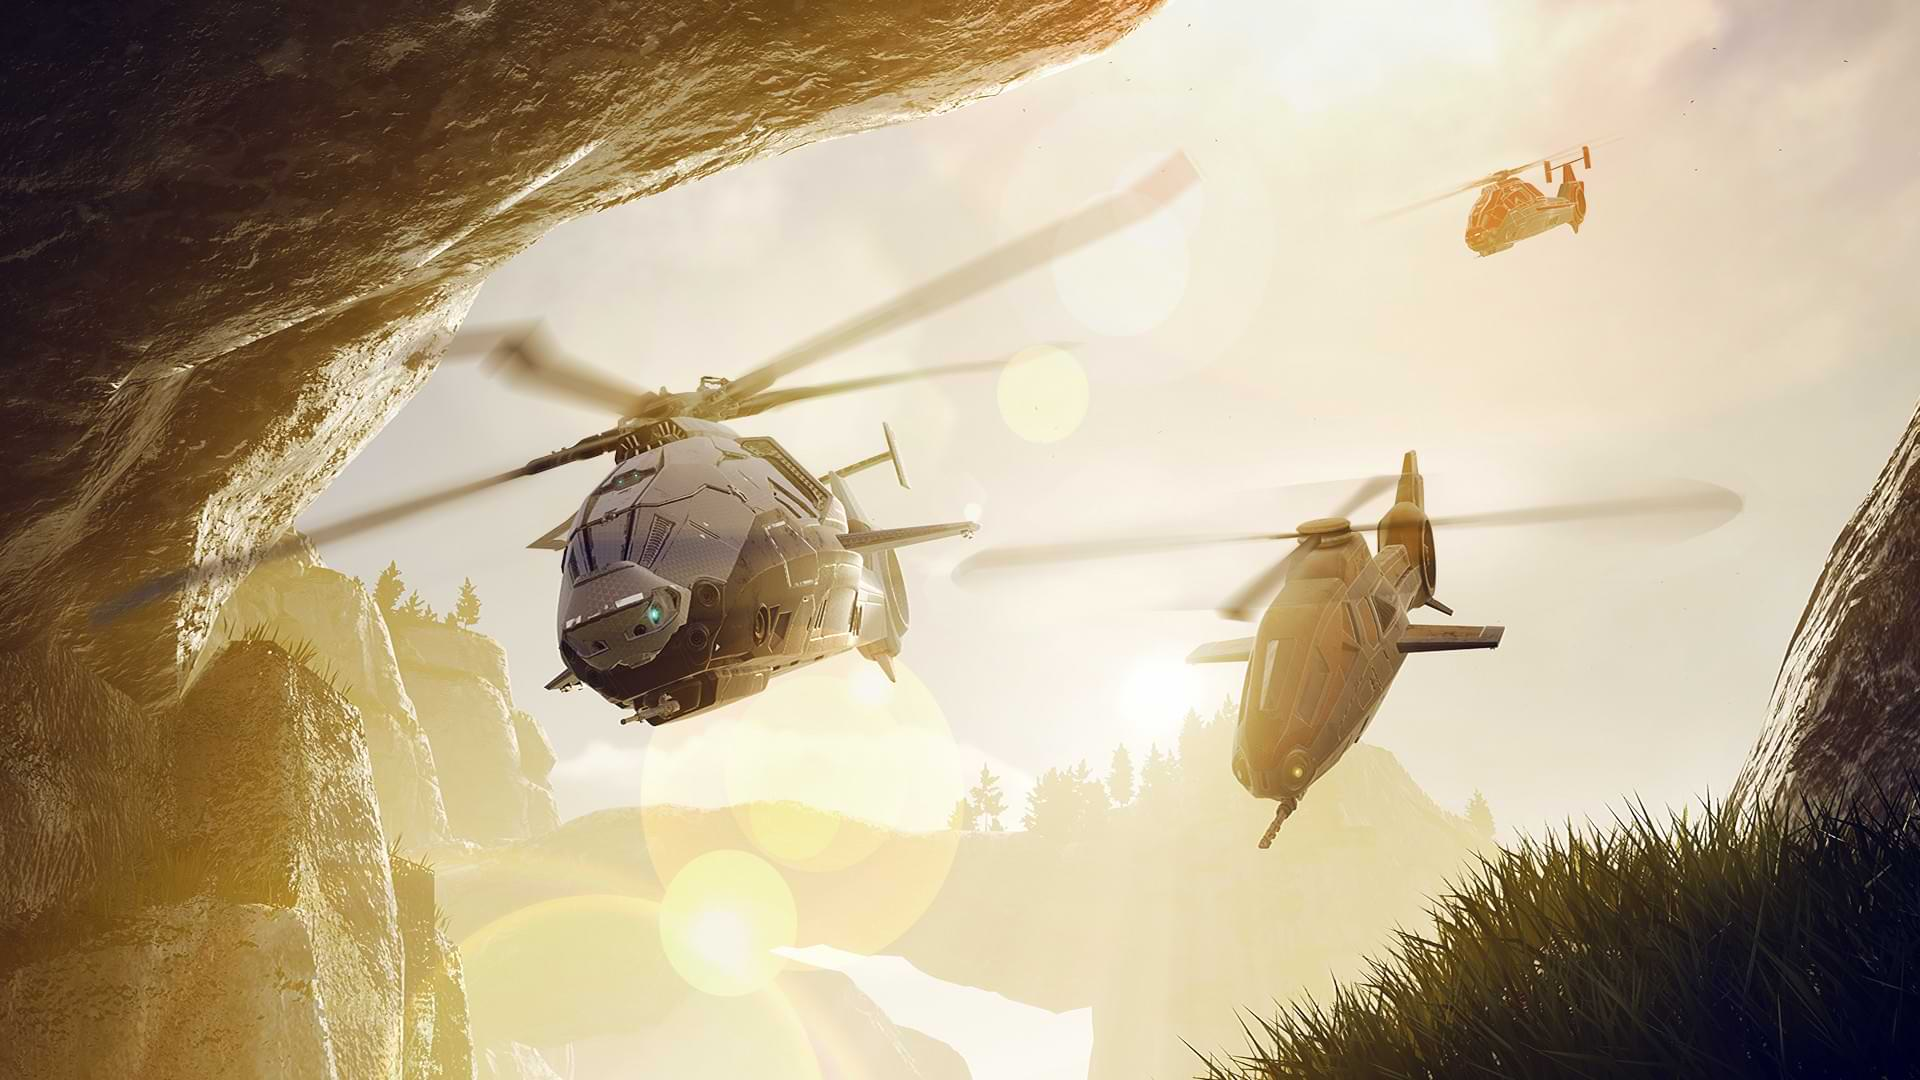 Comanche free multiplayer mode on Steam